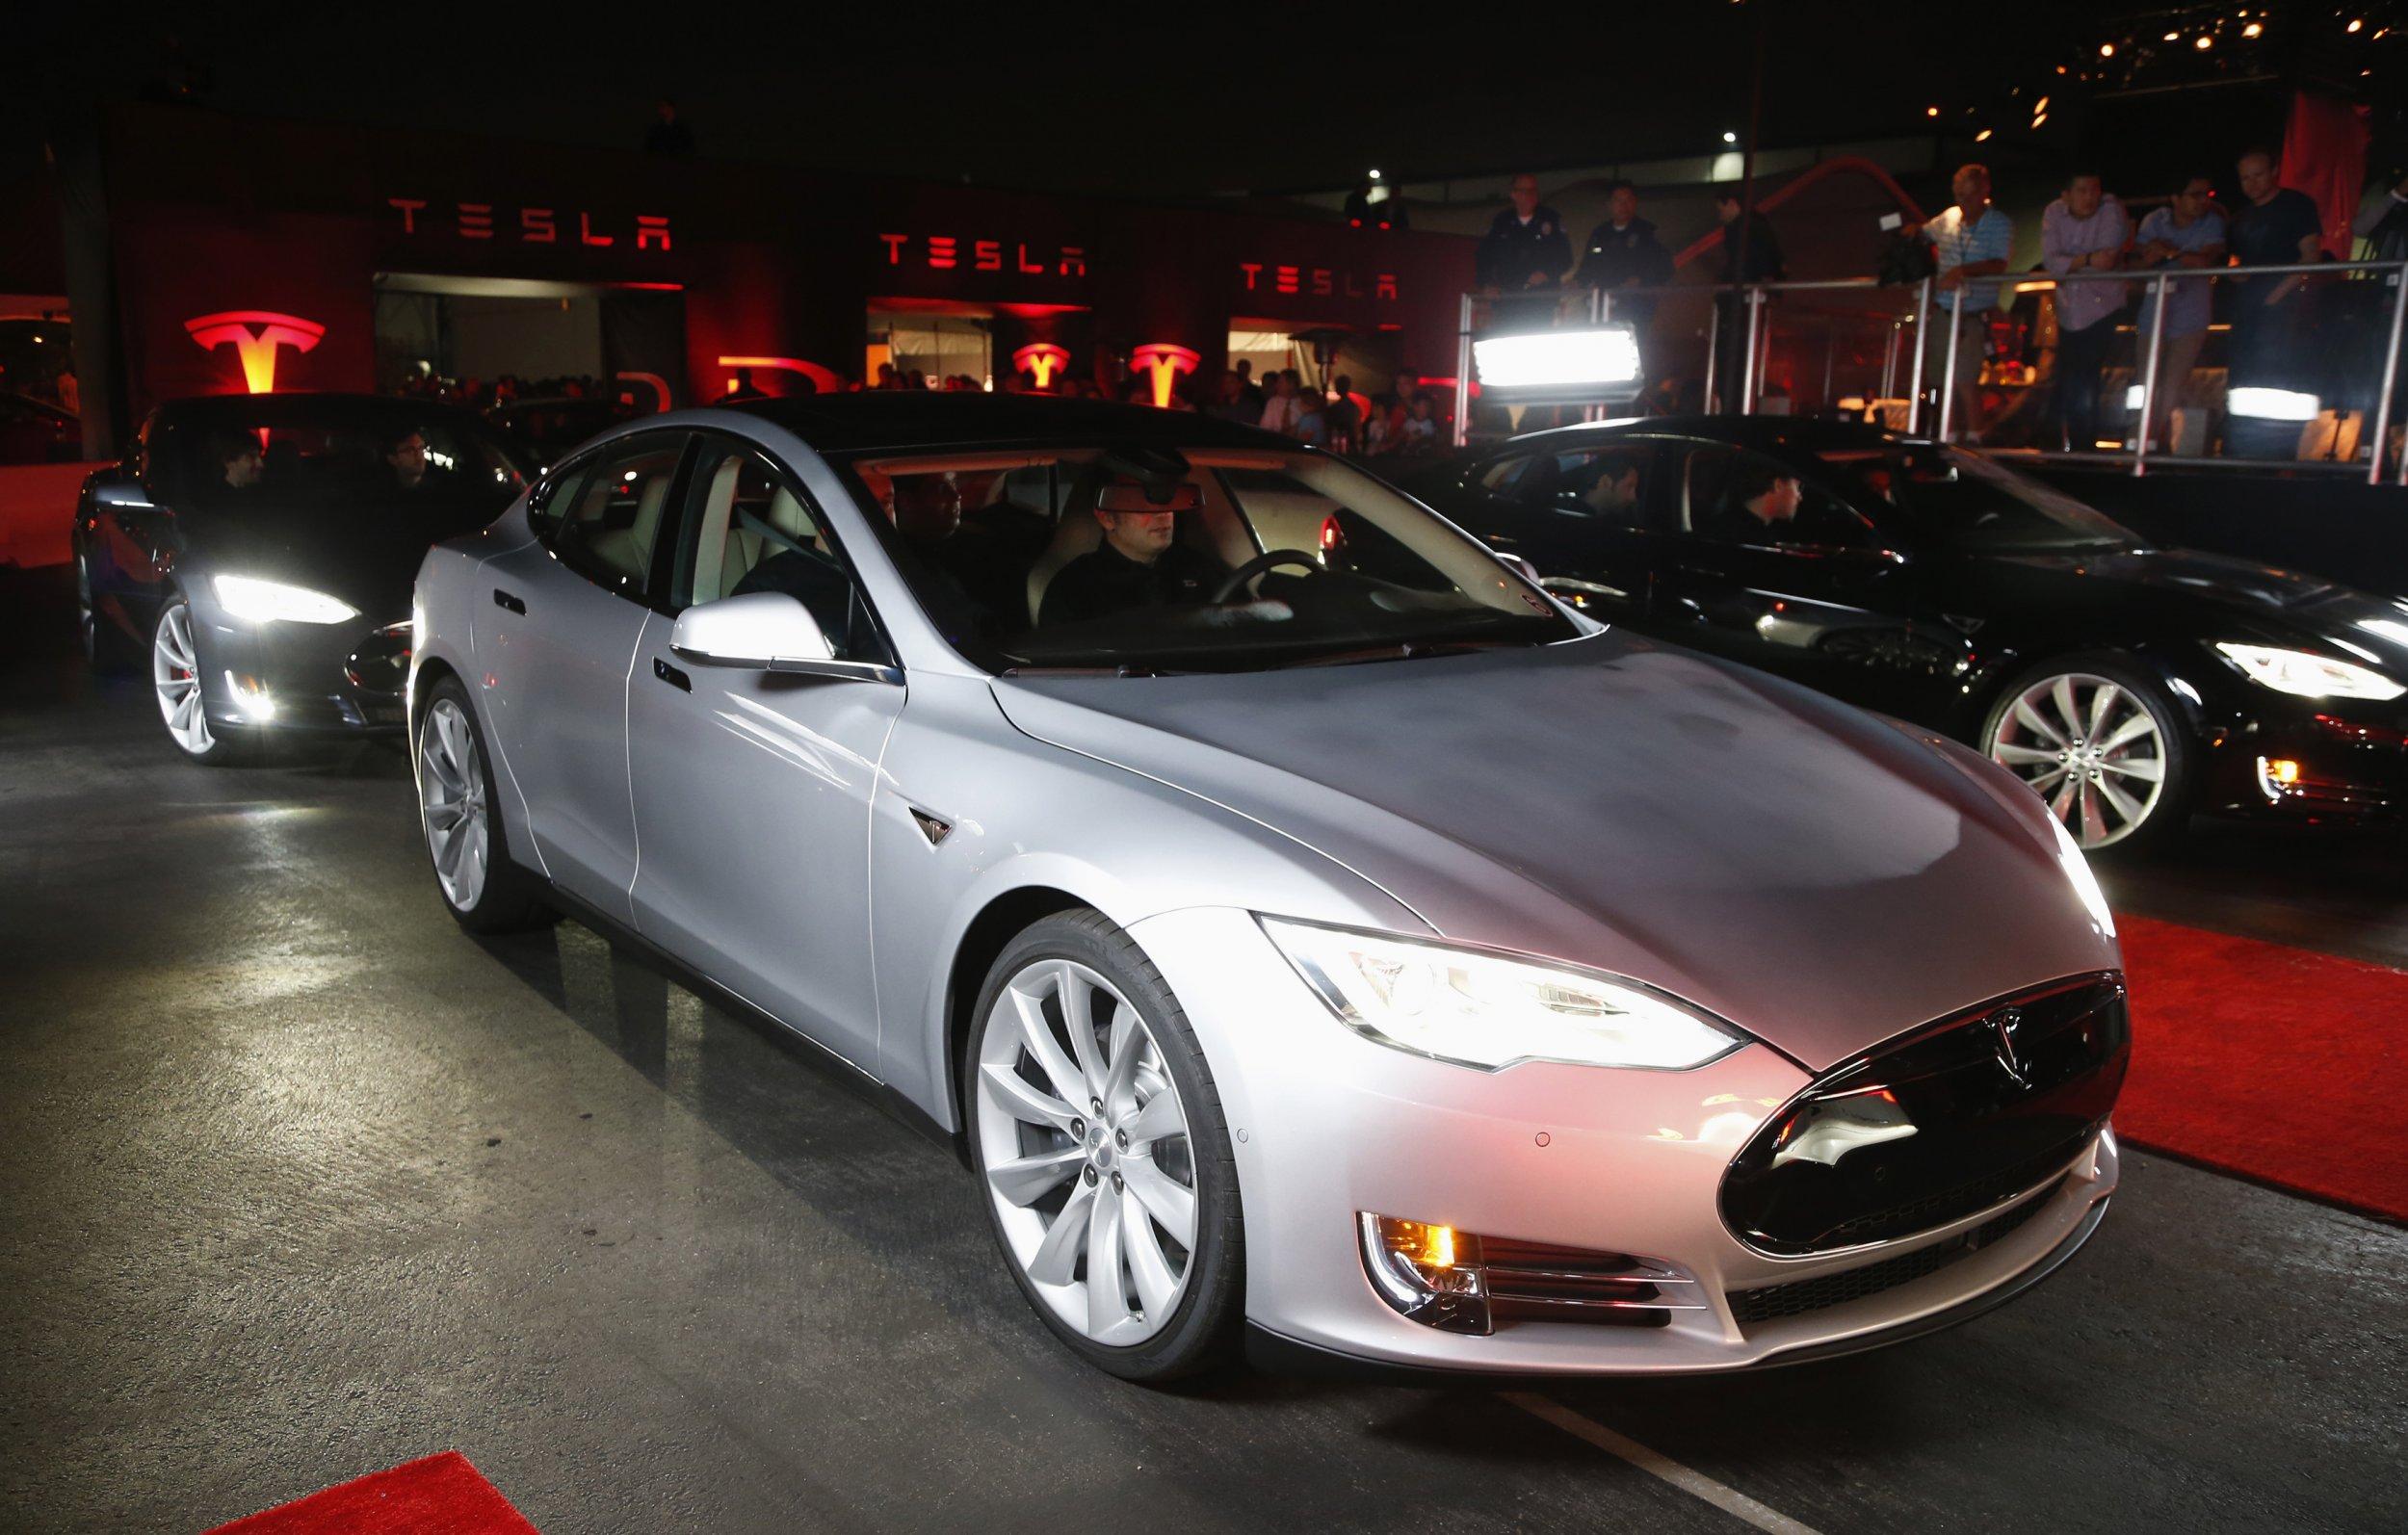 Tesla unveils ultra-fast Luuudicrous Mode